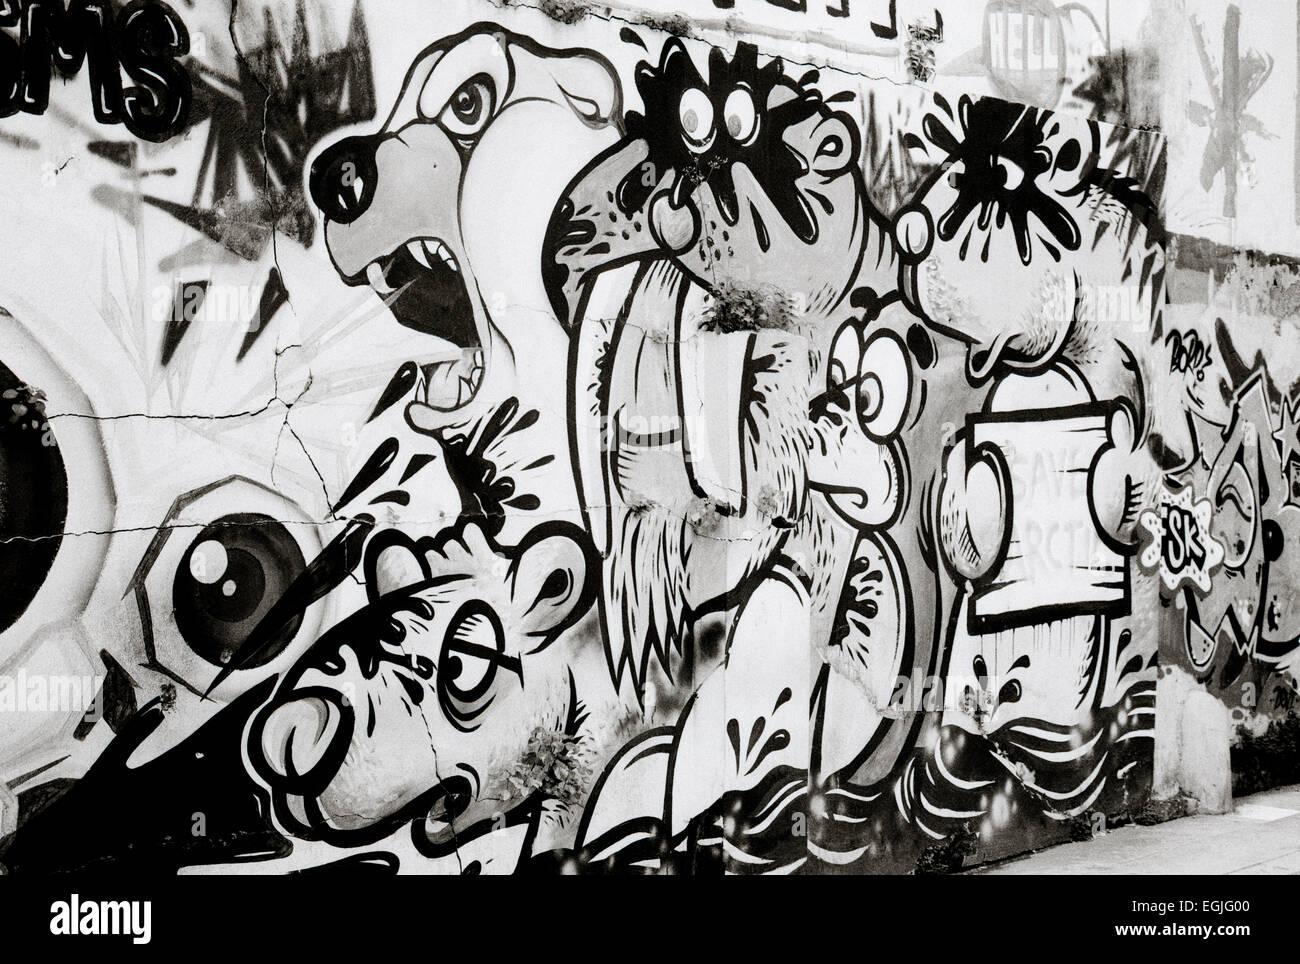 Fantastique Urban street art graffiti in Surabaya in Java in Indonesia in QE-25